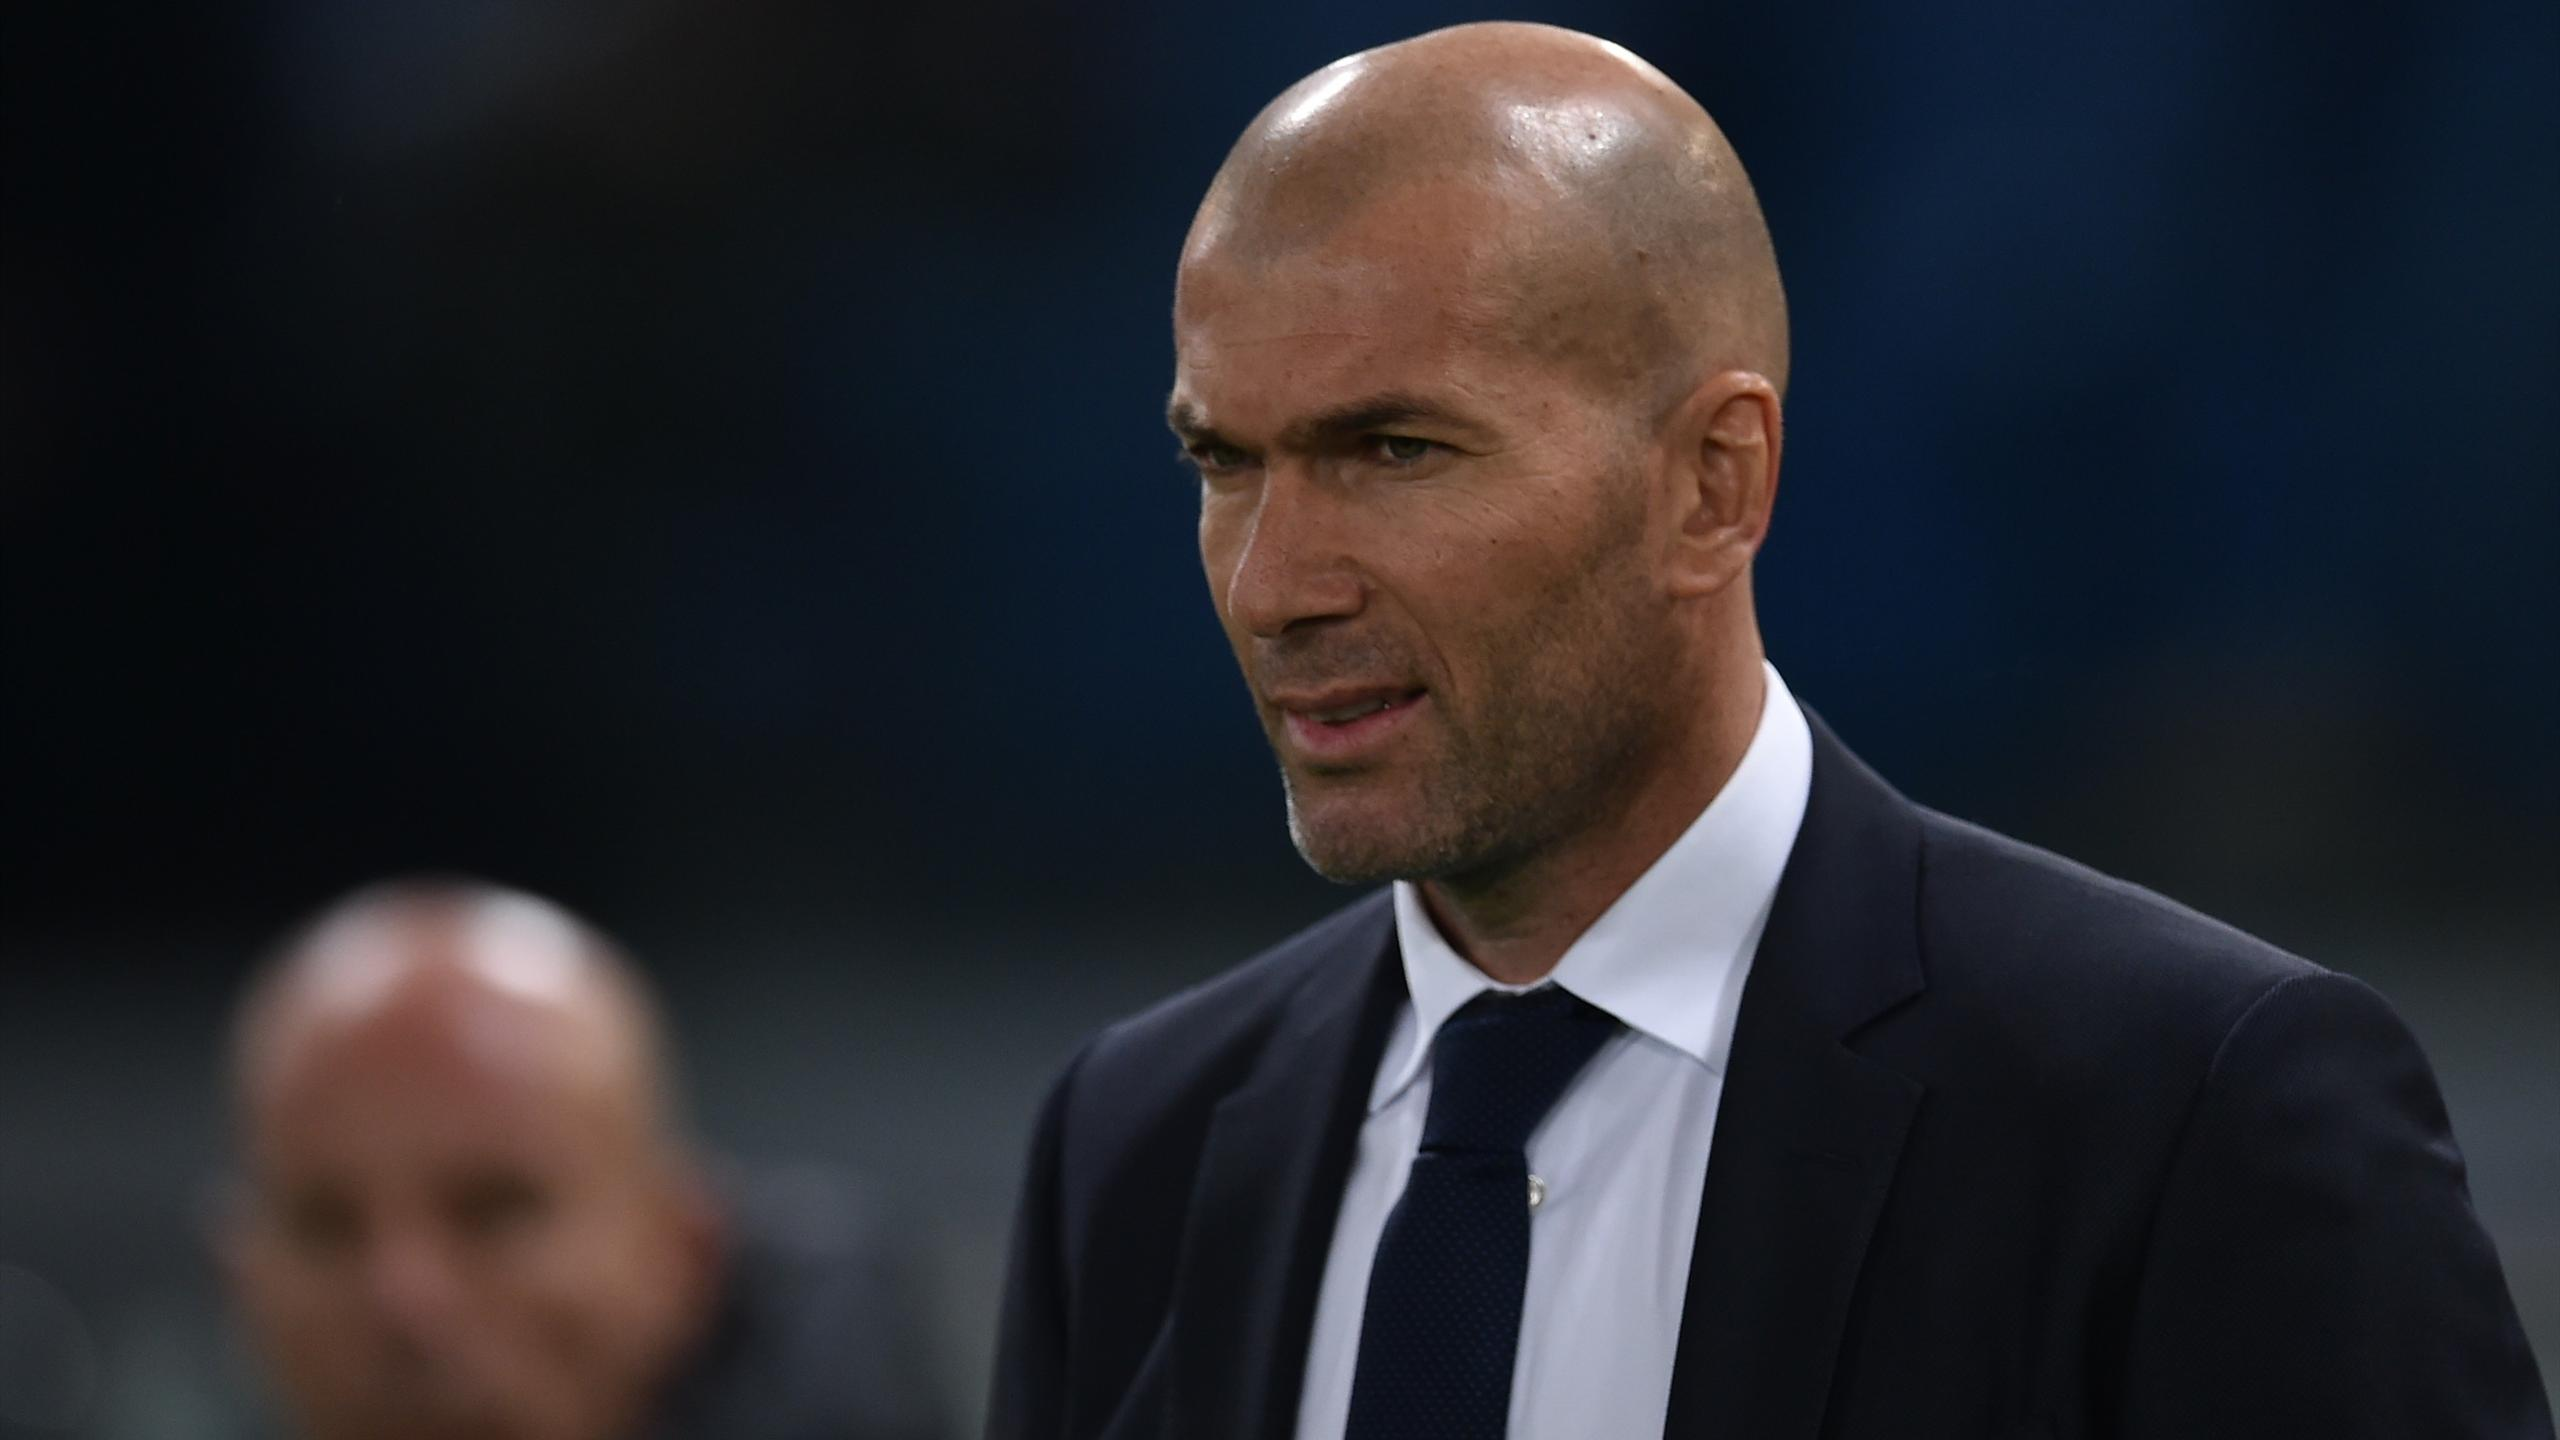 L'entraîneur du Real Madrid, Zinedine Zidane